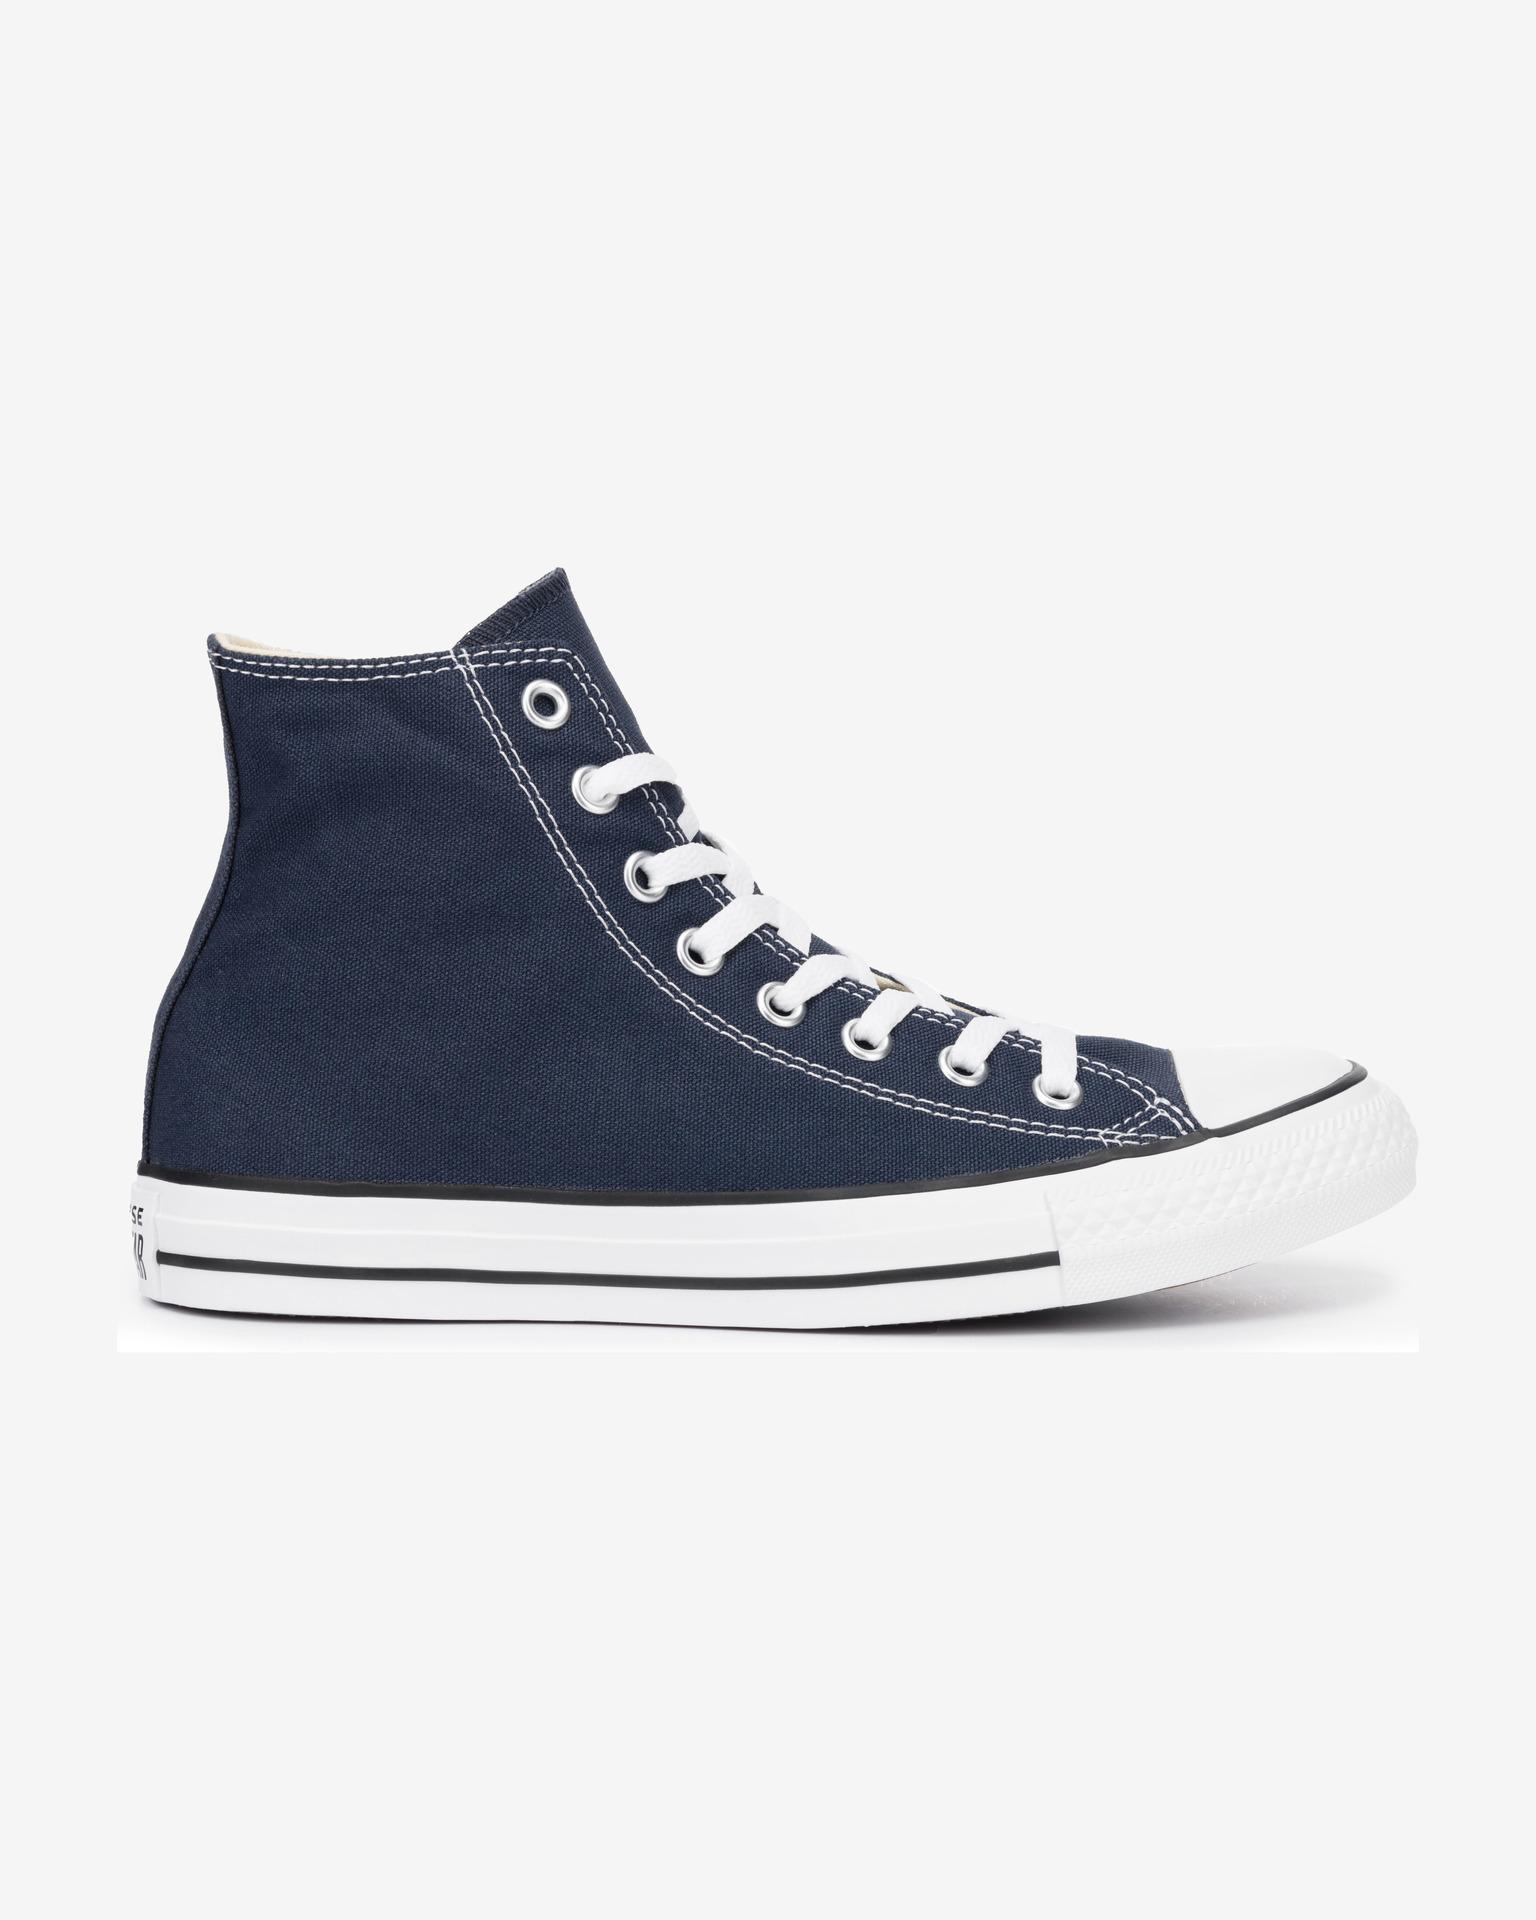 Converse modré pánské boty Chuck Taylor All Star Navy - 42